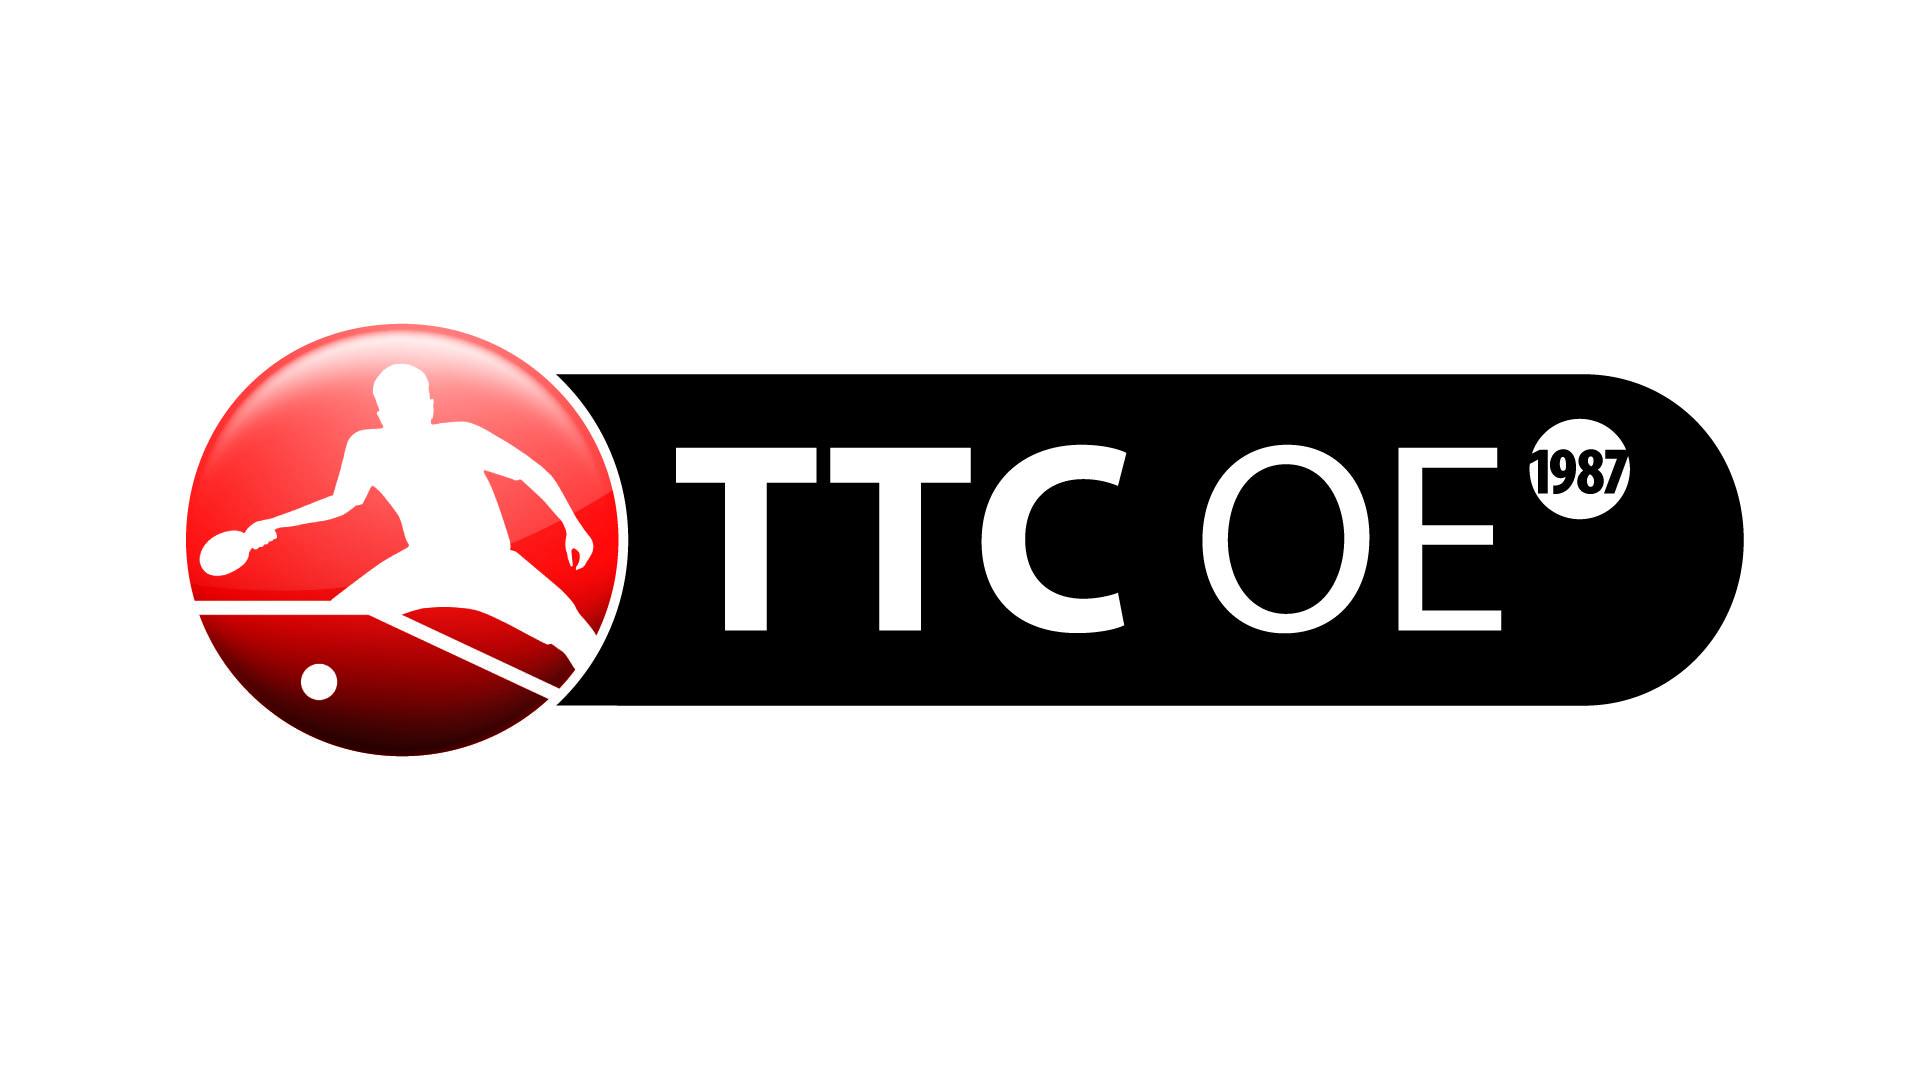 TTCOE_Logo_FX_4C_01.2